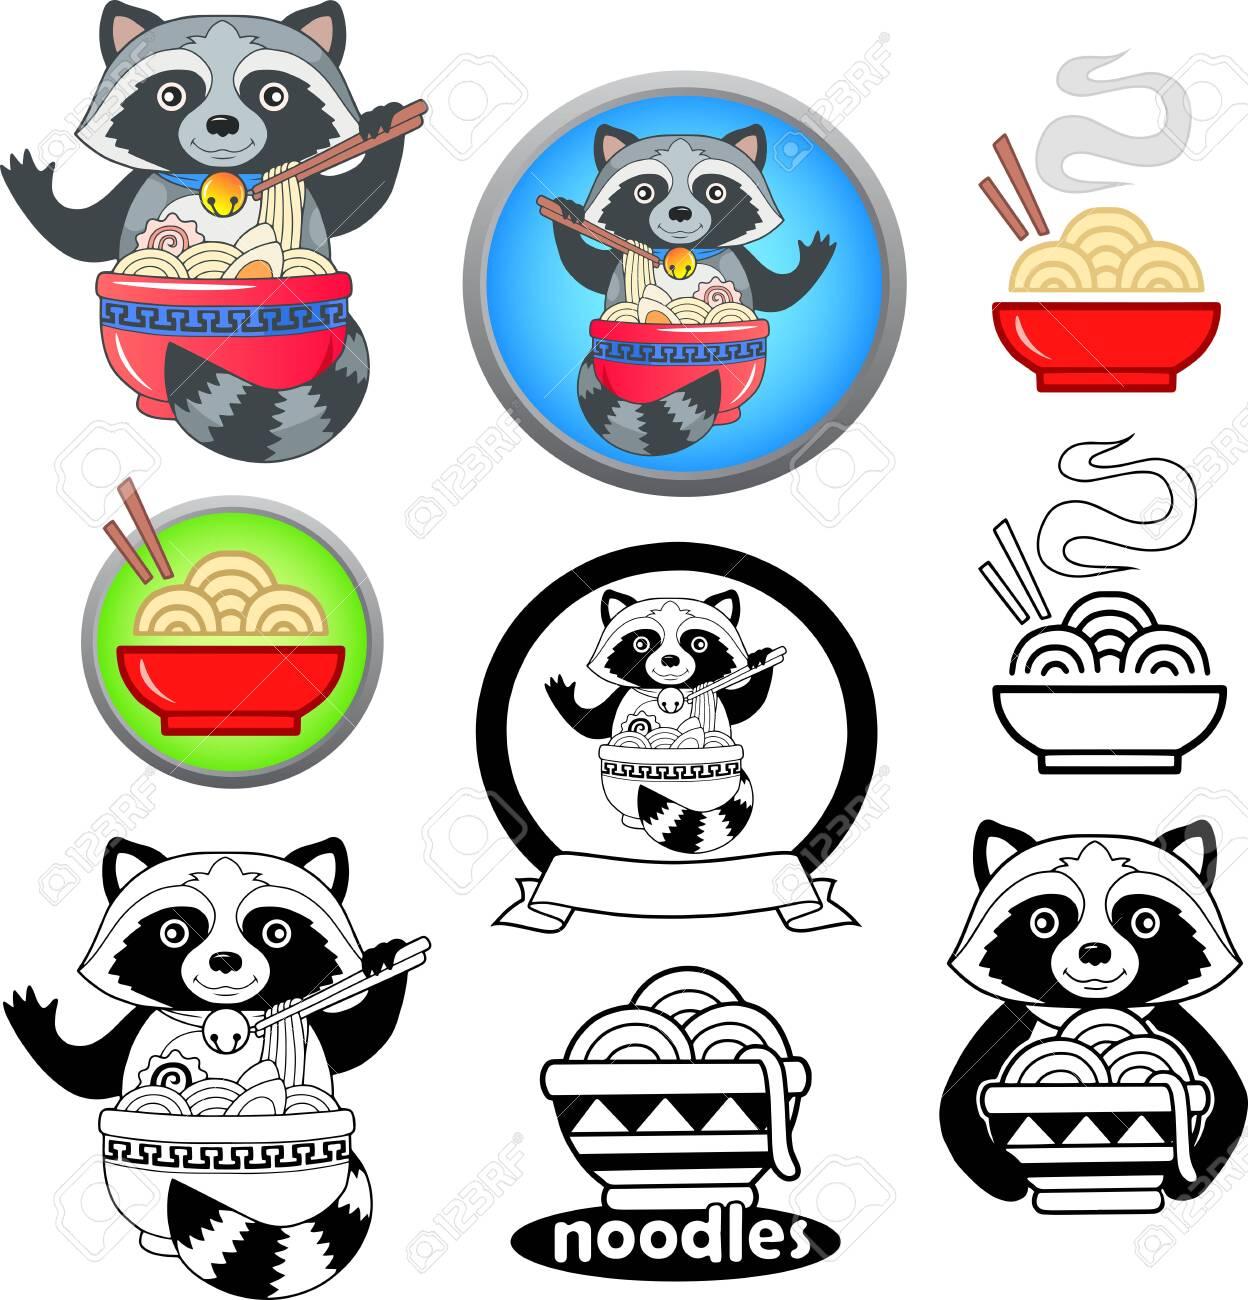 Cartoon Cute Raccoon Eating Ramen Noodles Funny Illustration 1248x1300